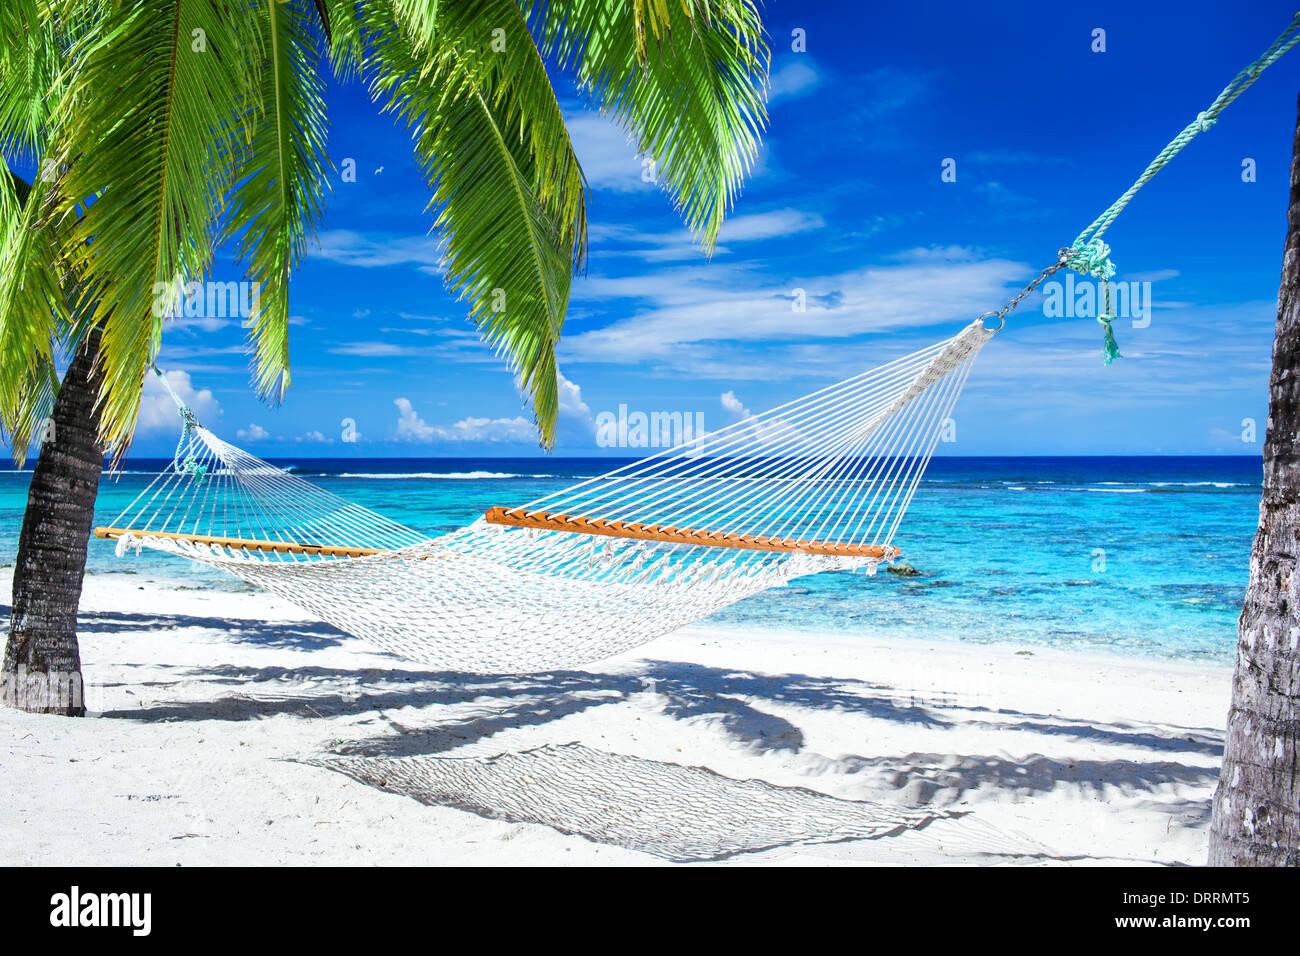 Empty hammock between palm trees on tropical beach - Stock Image